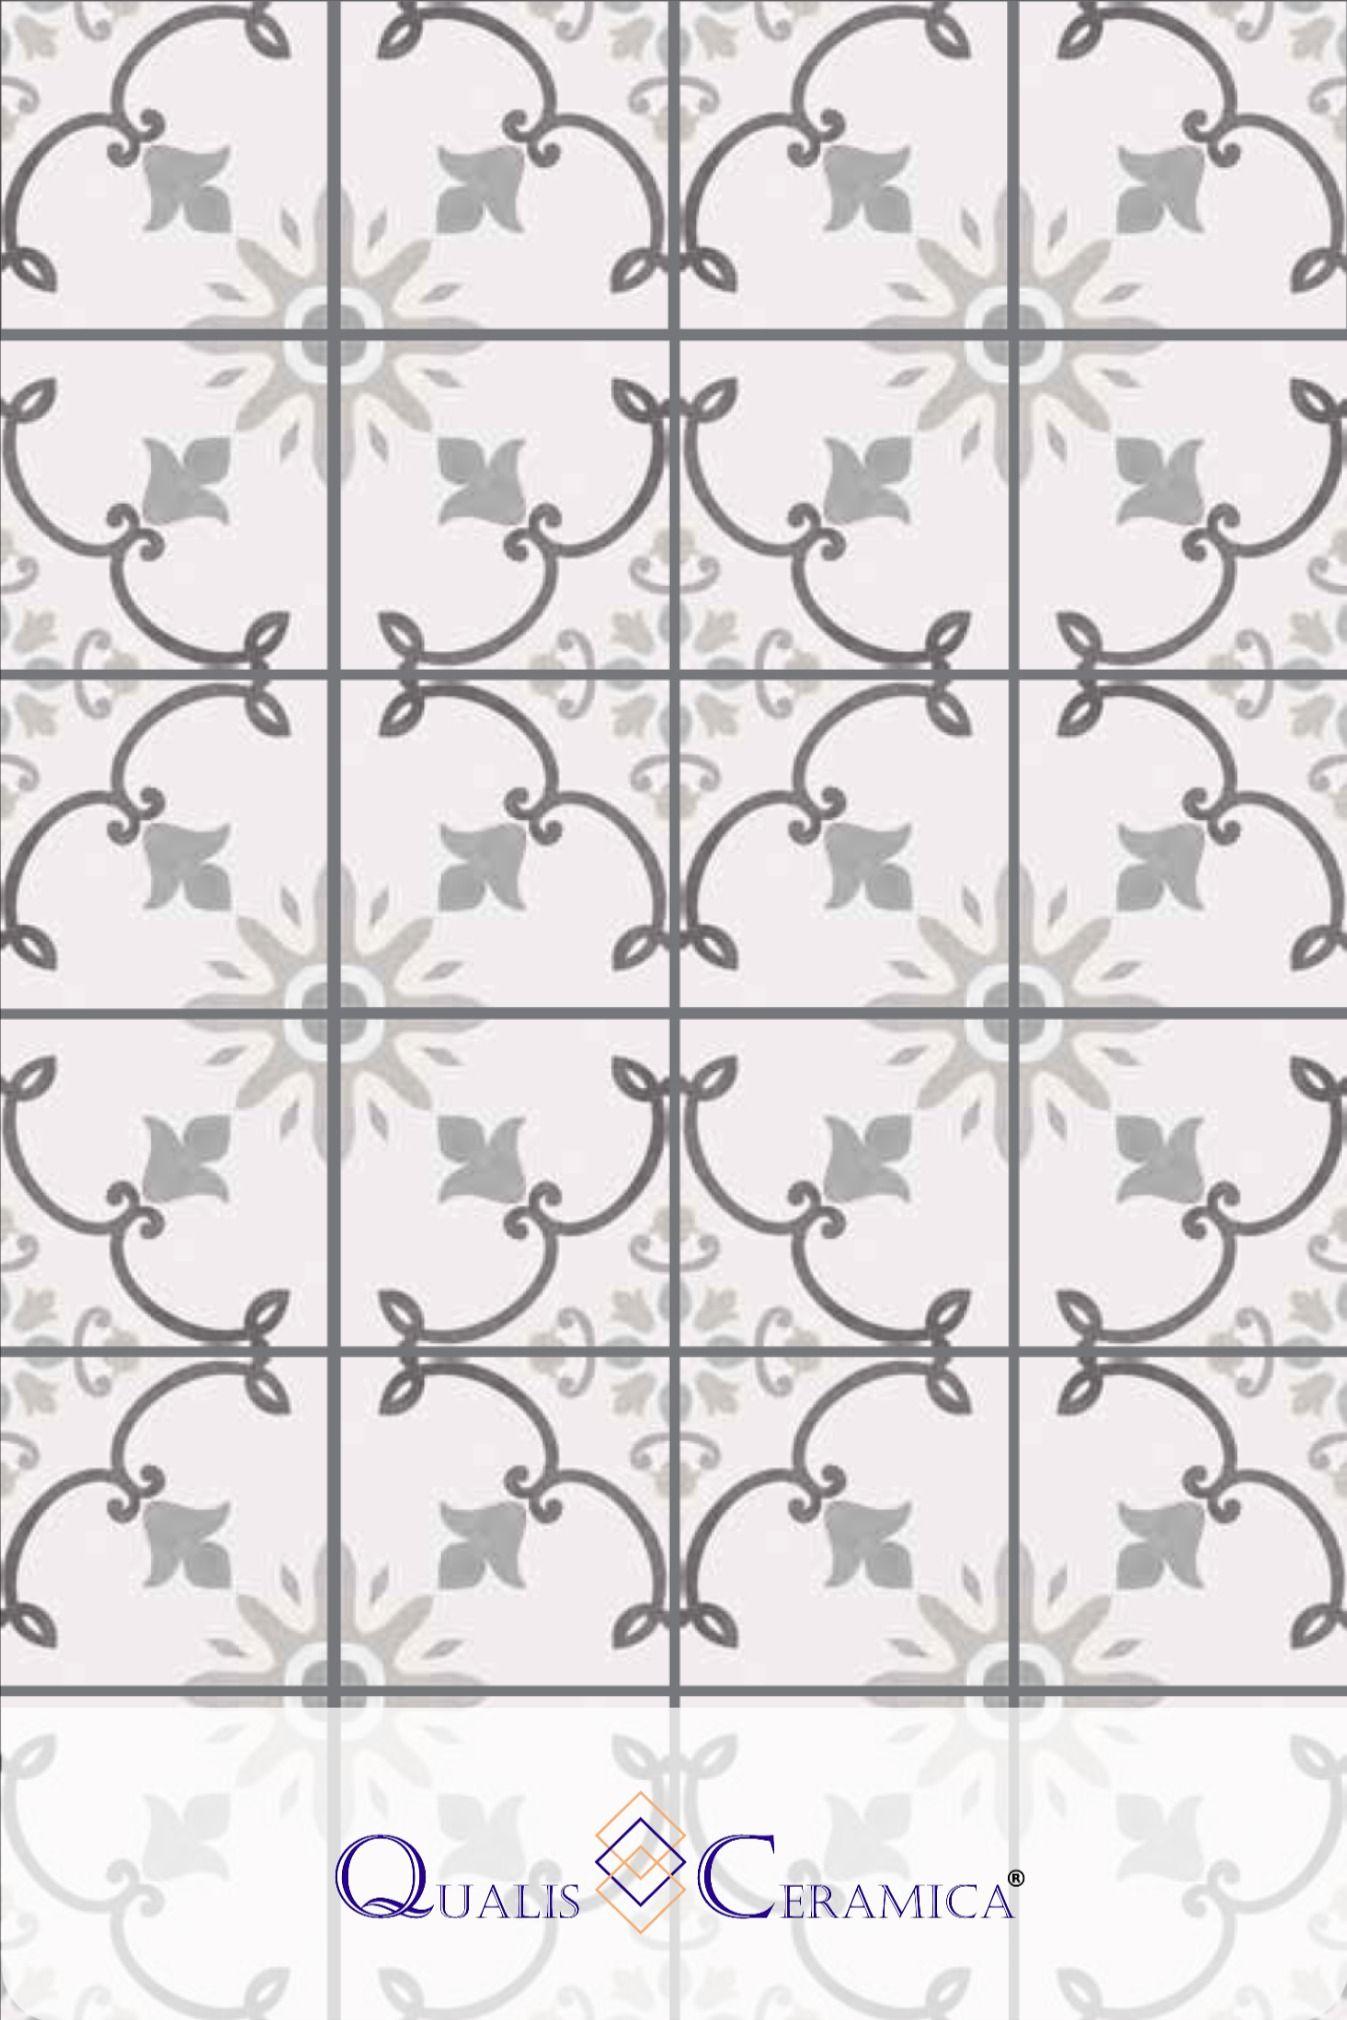 Qualis Ceramica Gibraltar Alameda Gris Low Maintenance Tile Slip Resistant Tile 10x10 Cement L In 2020 Porcelain Floor Tiles Slip Resistant Tiles Modern Tiles